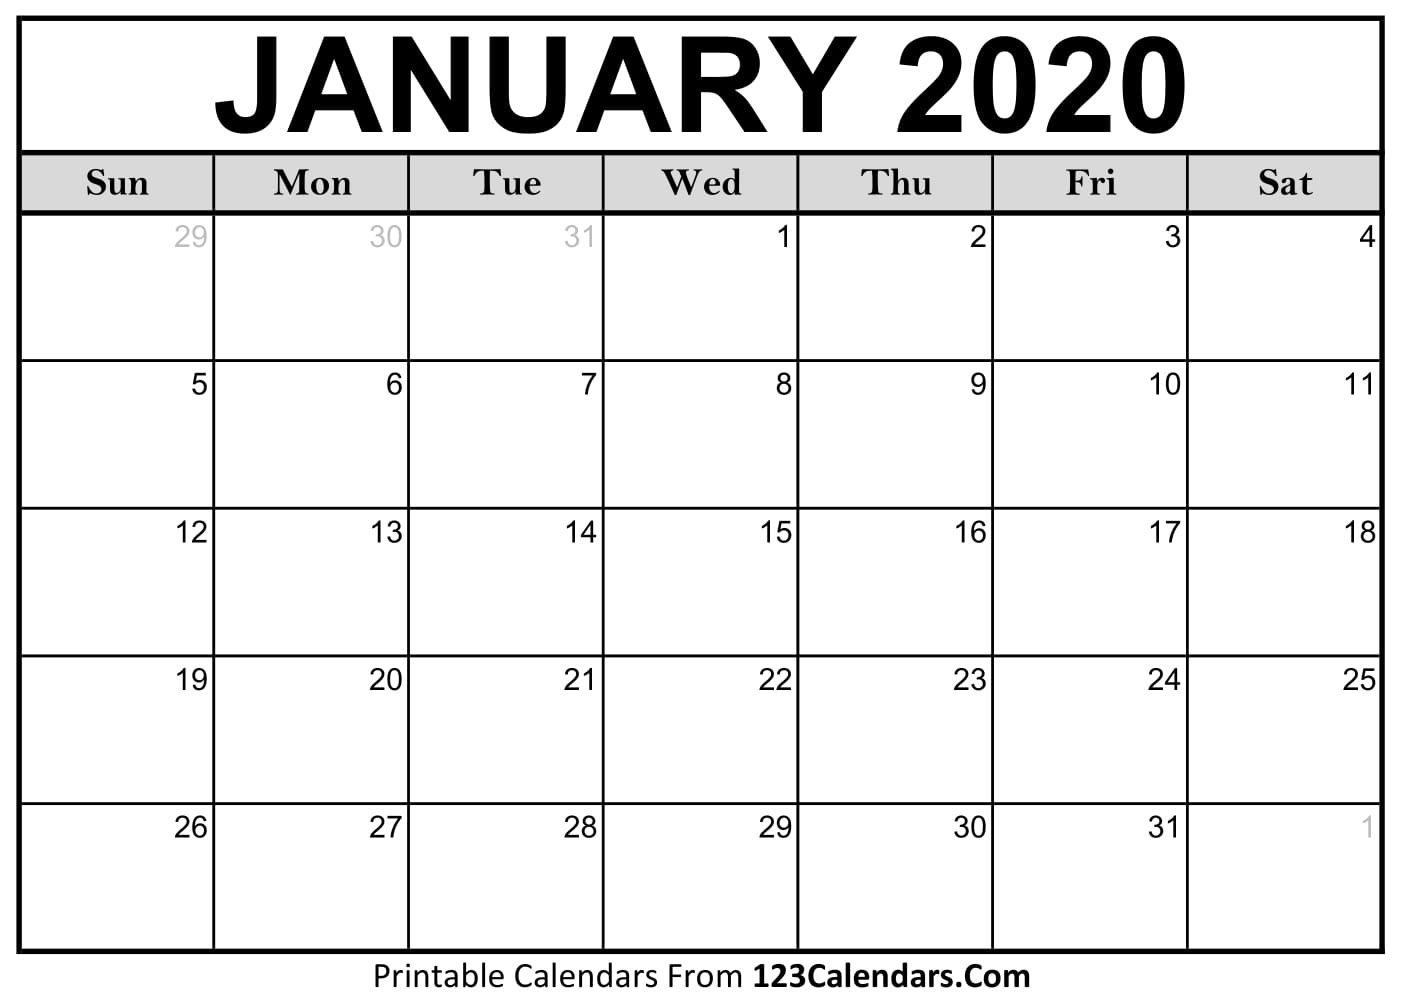 Printable Fill In Calendar For 2020 - Calendar Inspiration Free Printable Fill In Calendars